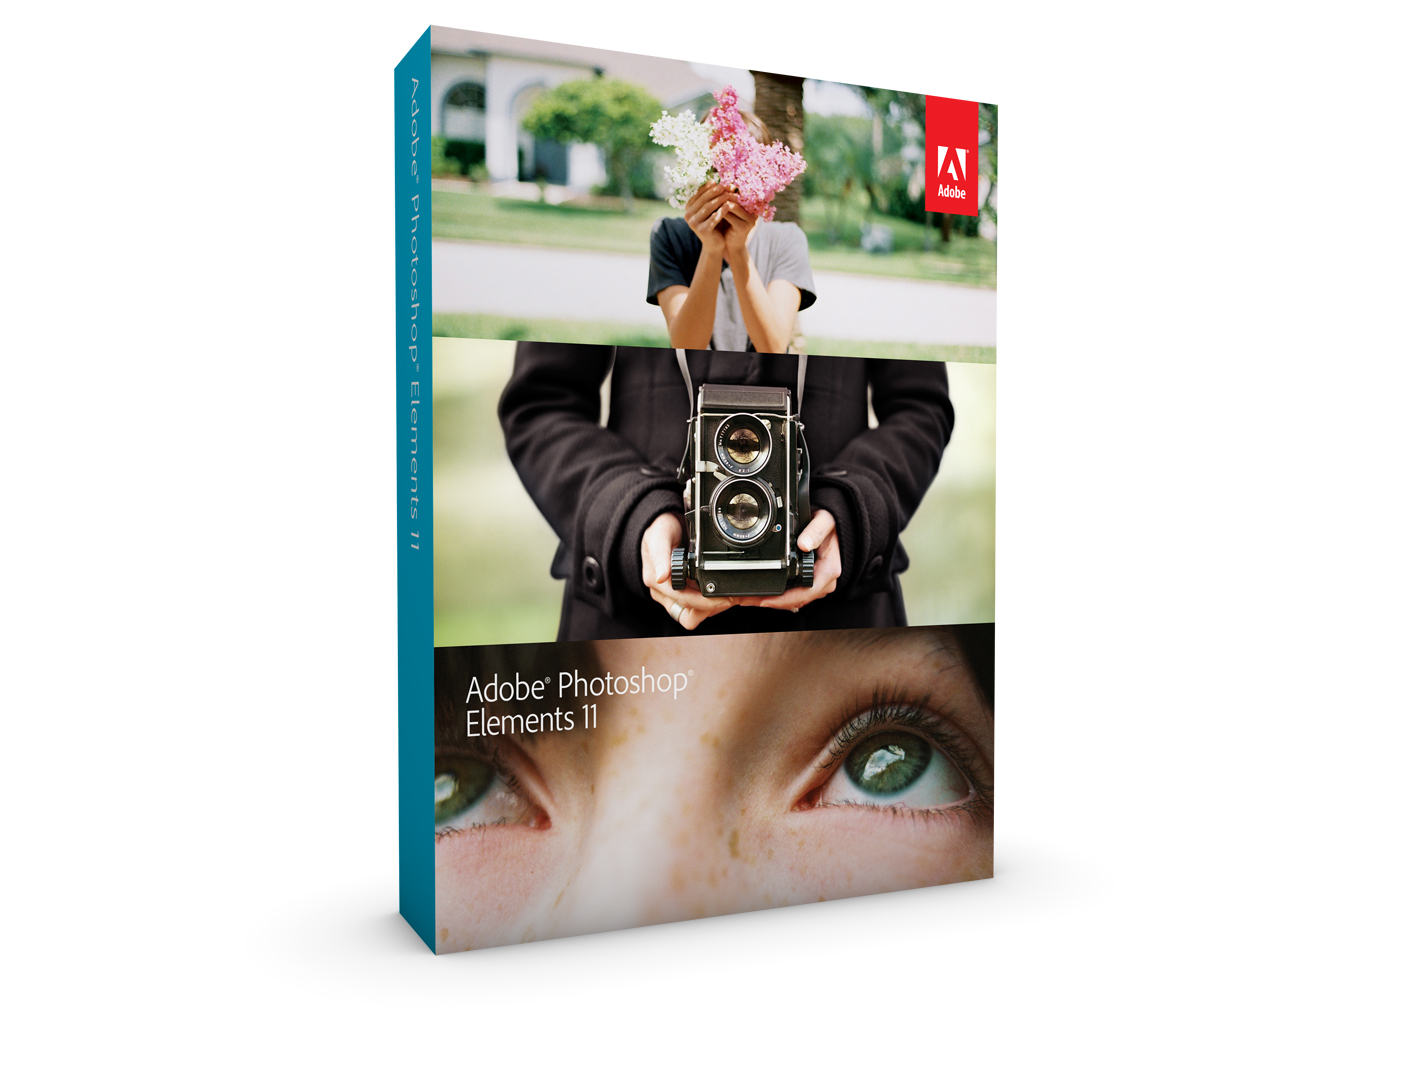 Portable photoshop elements